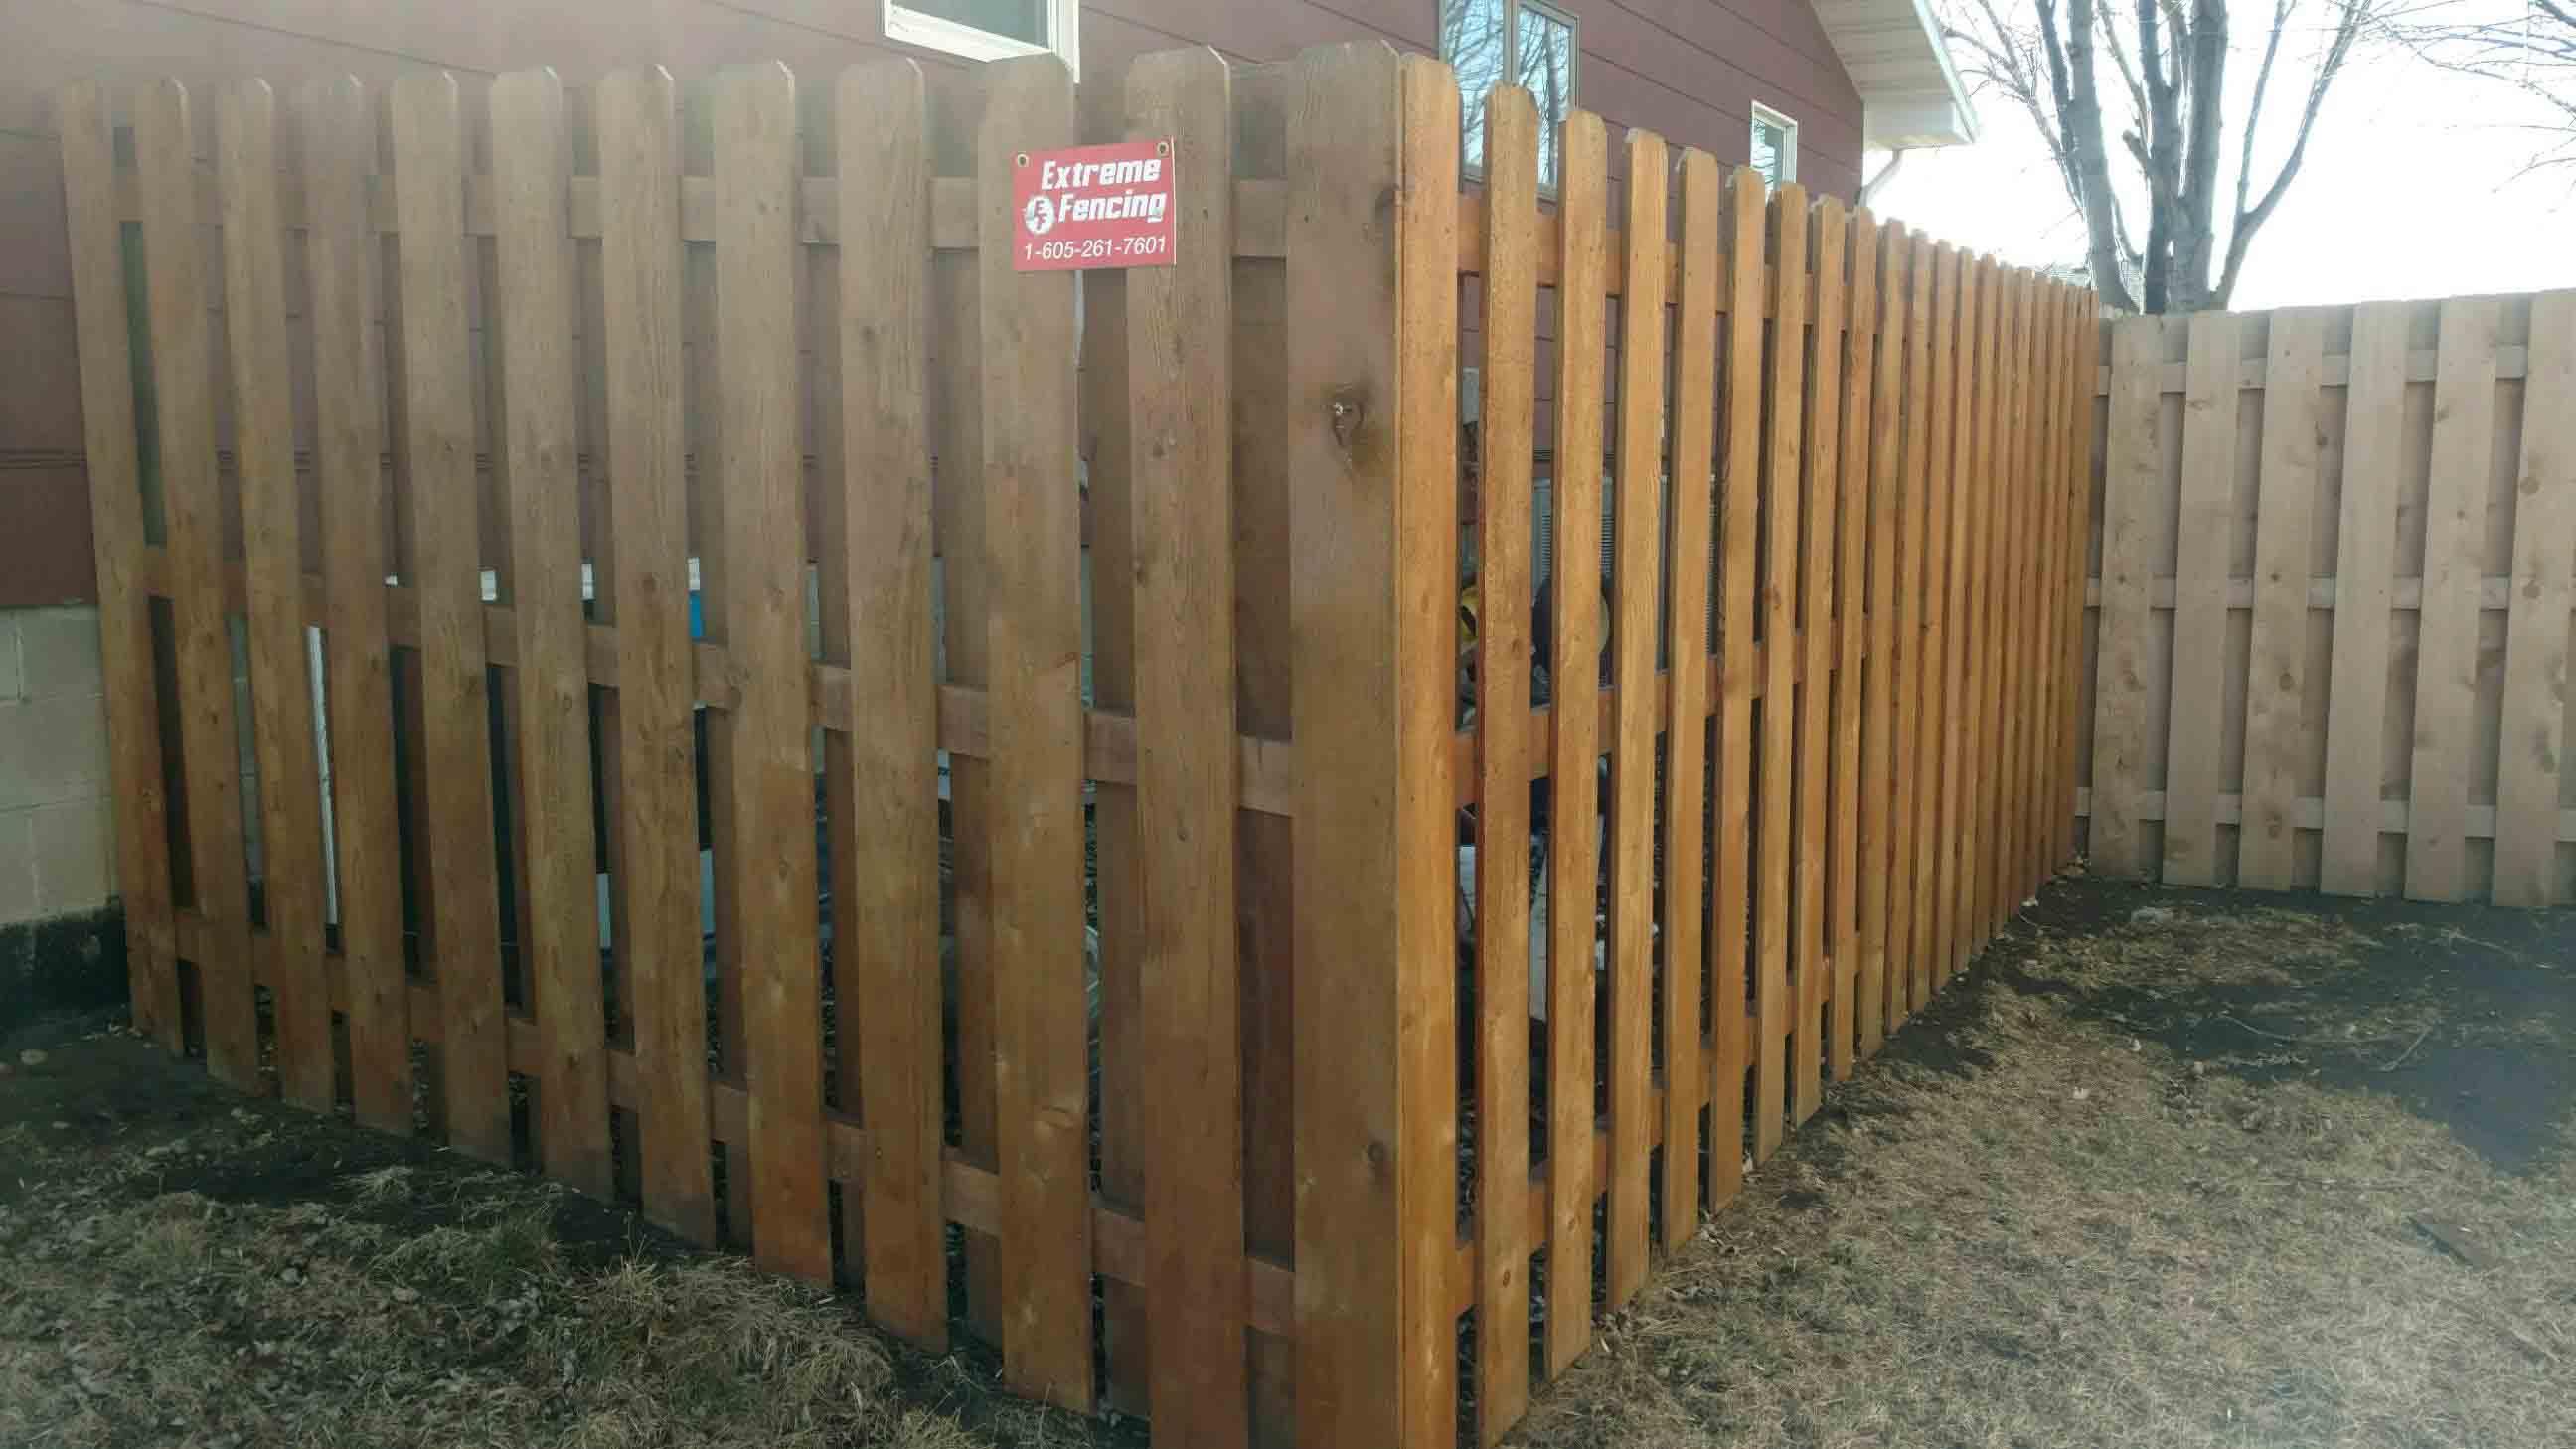 Fence Repair Tea Sioux Falls Sd Extreme Fencing Llc